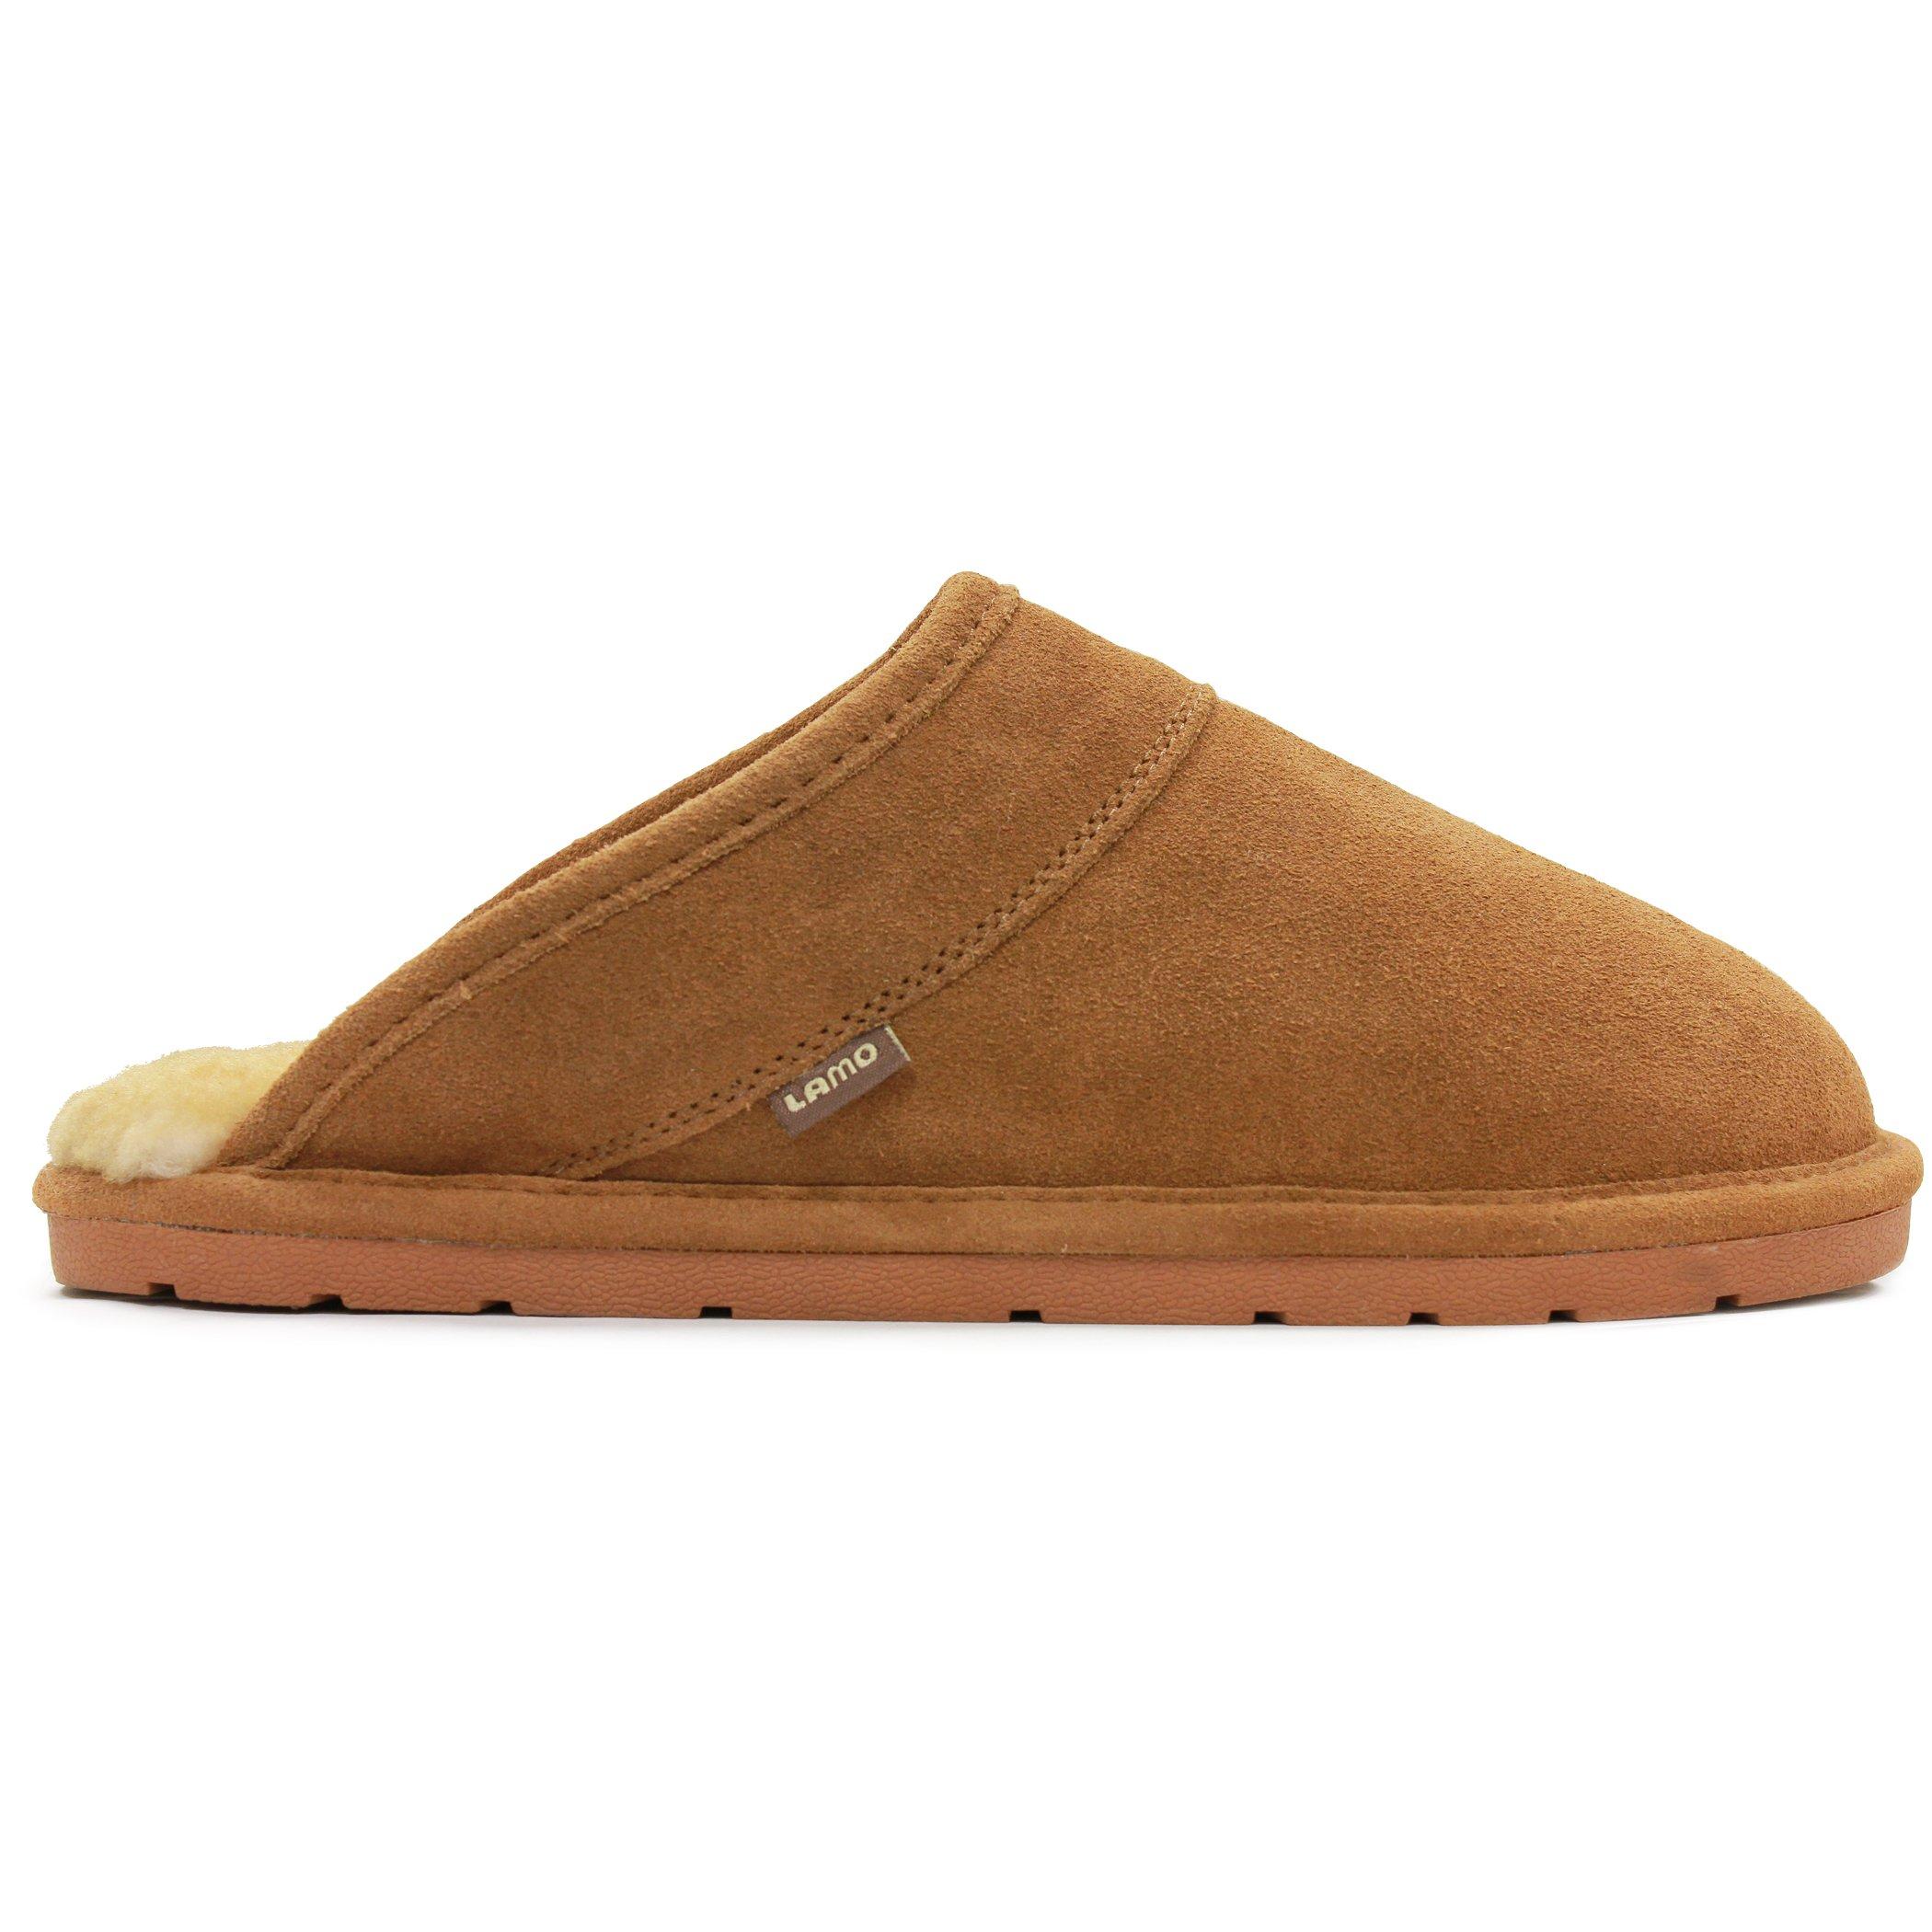 Lamo Men's Romeo Slip-On Loafer, Shoes, Suede, Chestnut, M M US